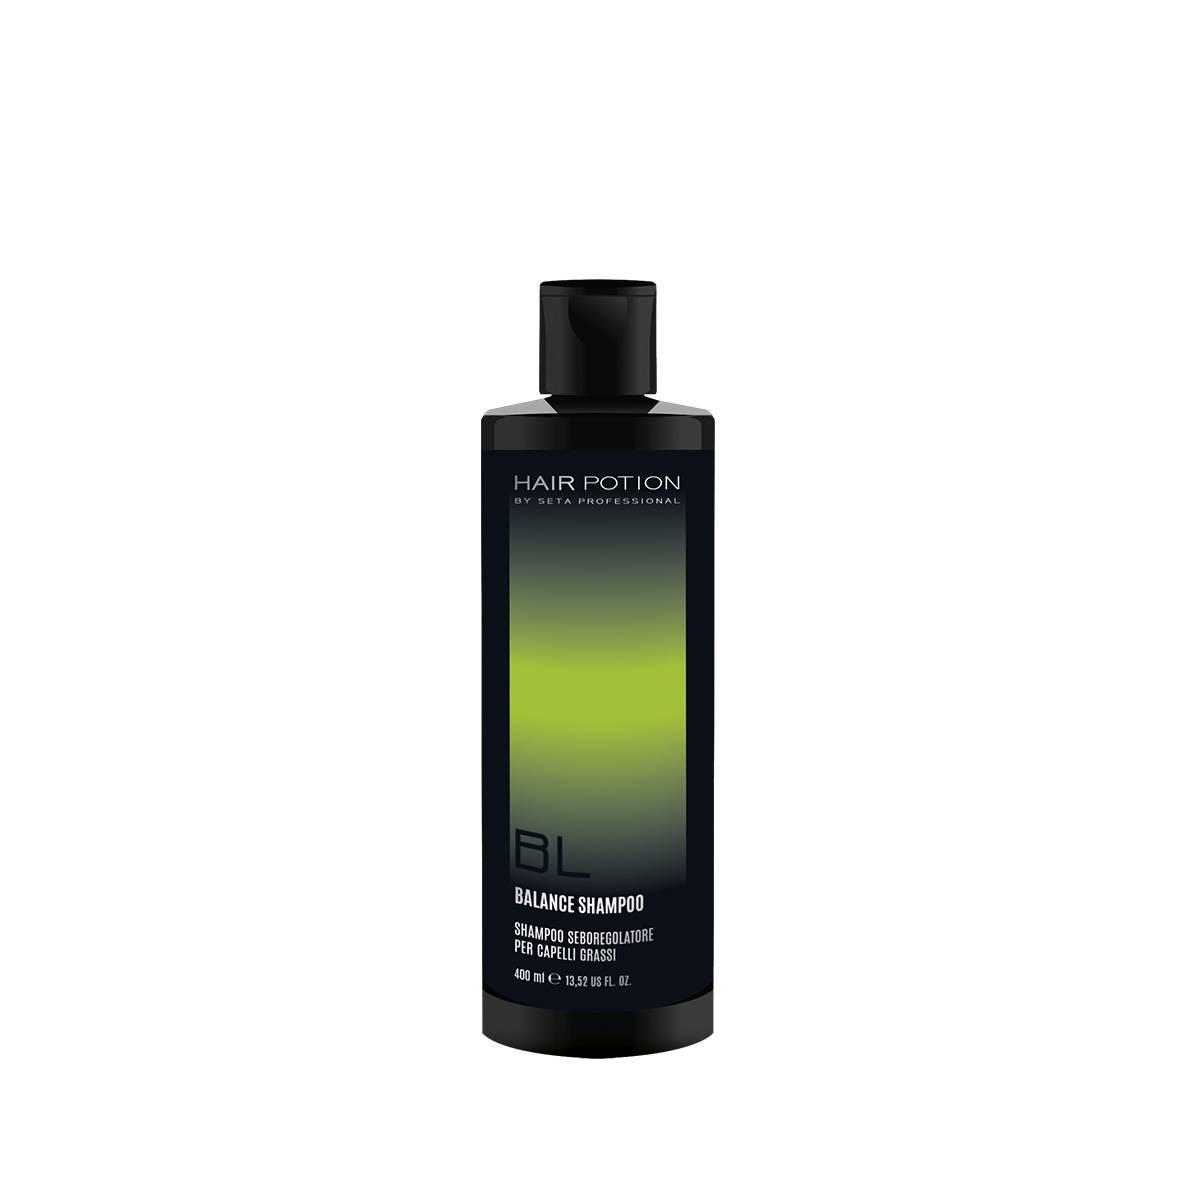 Hair Potion Pro Balance Shampoo 400ml